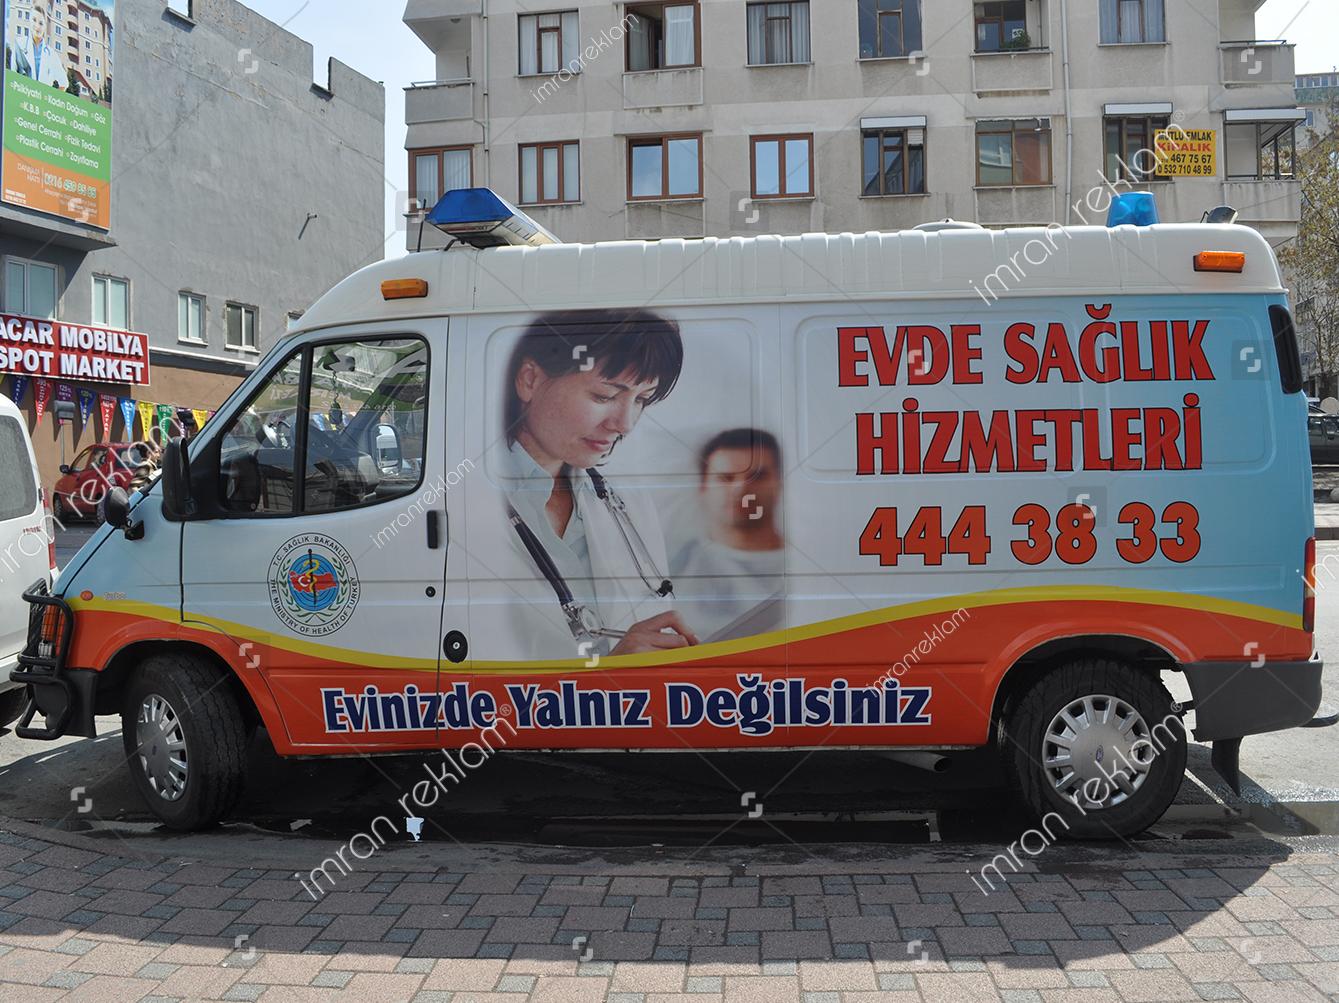 ambulans-giydirme-kaplama-renk-degisimi